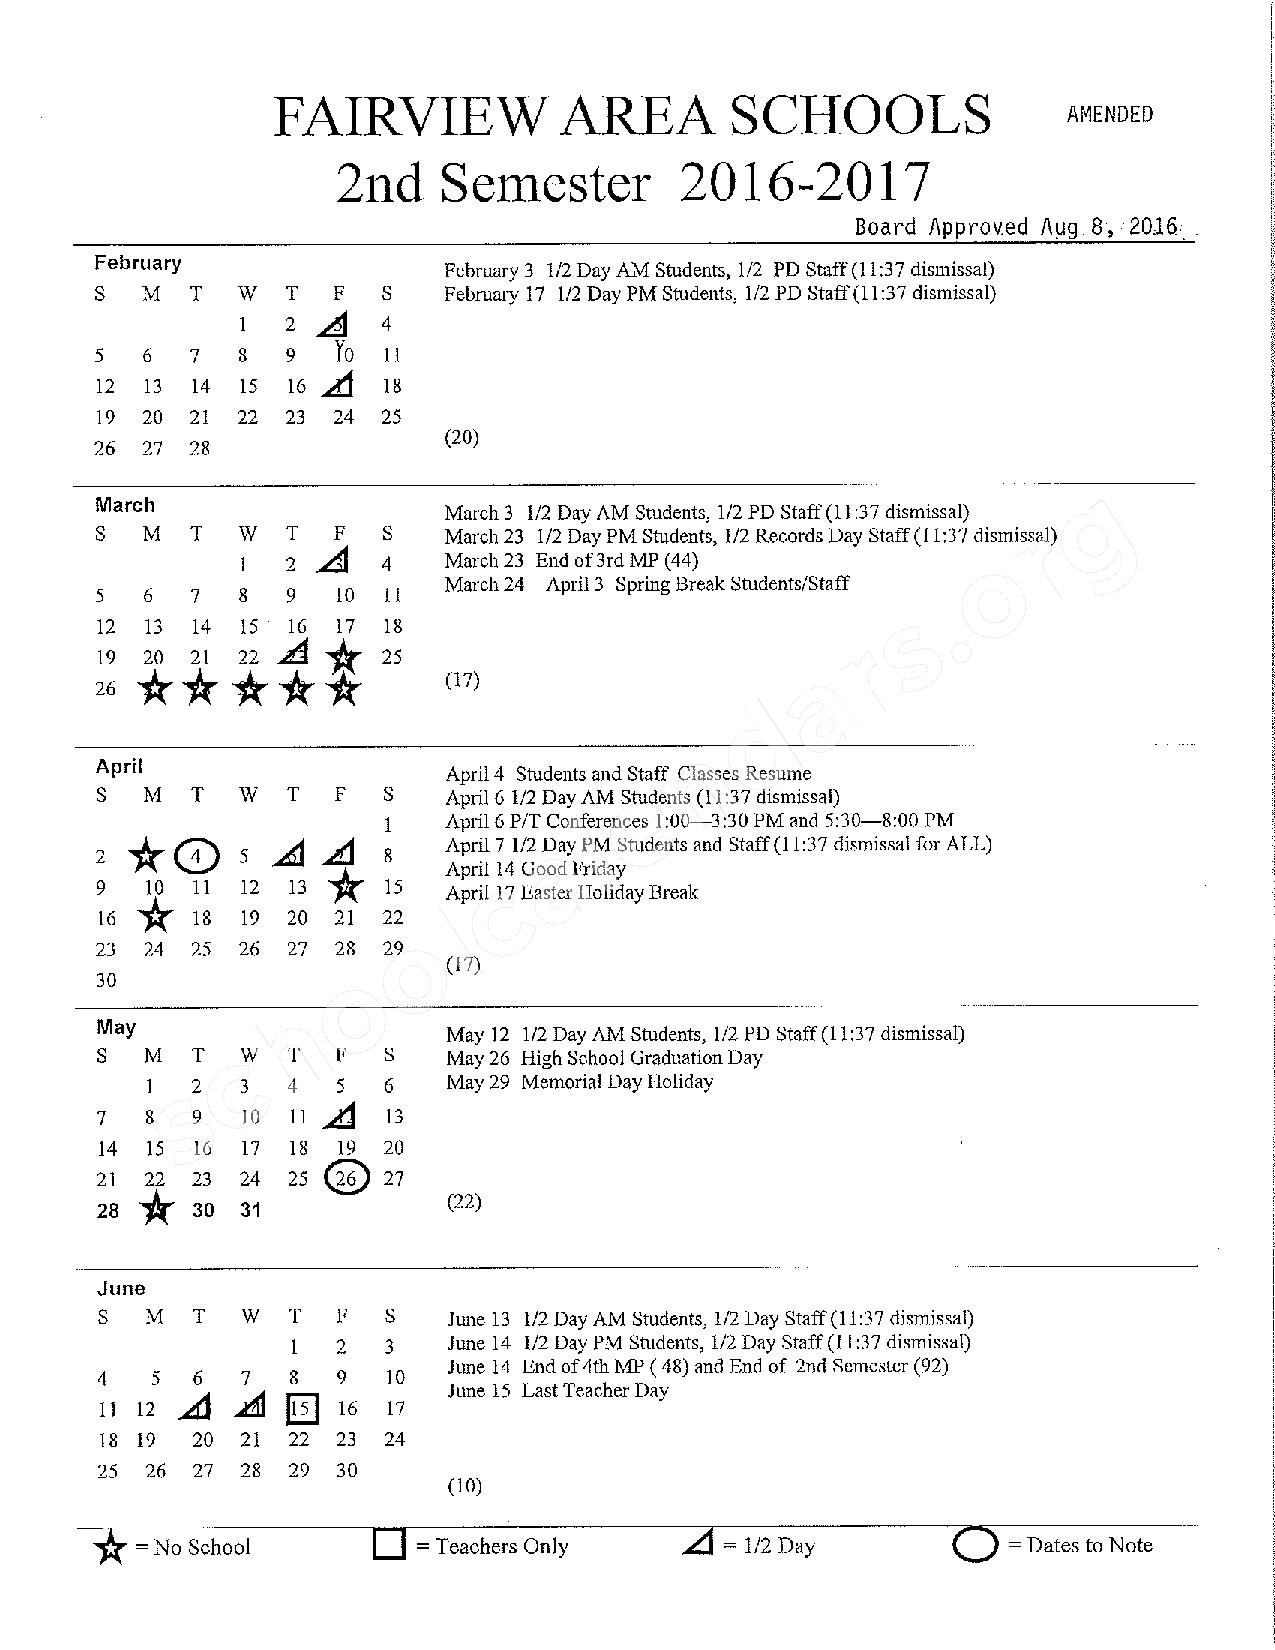 2016 - 2017 school calendar – Fairview Area School District – page 2